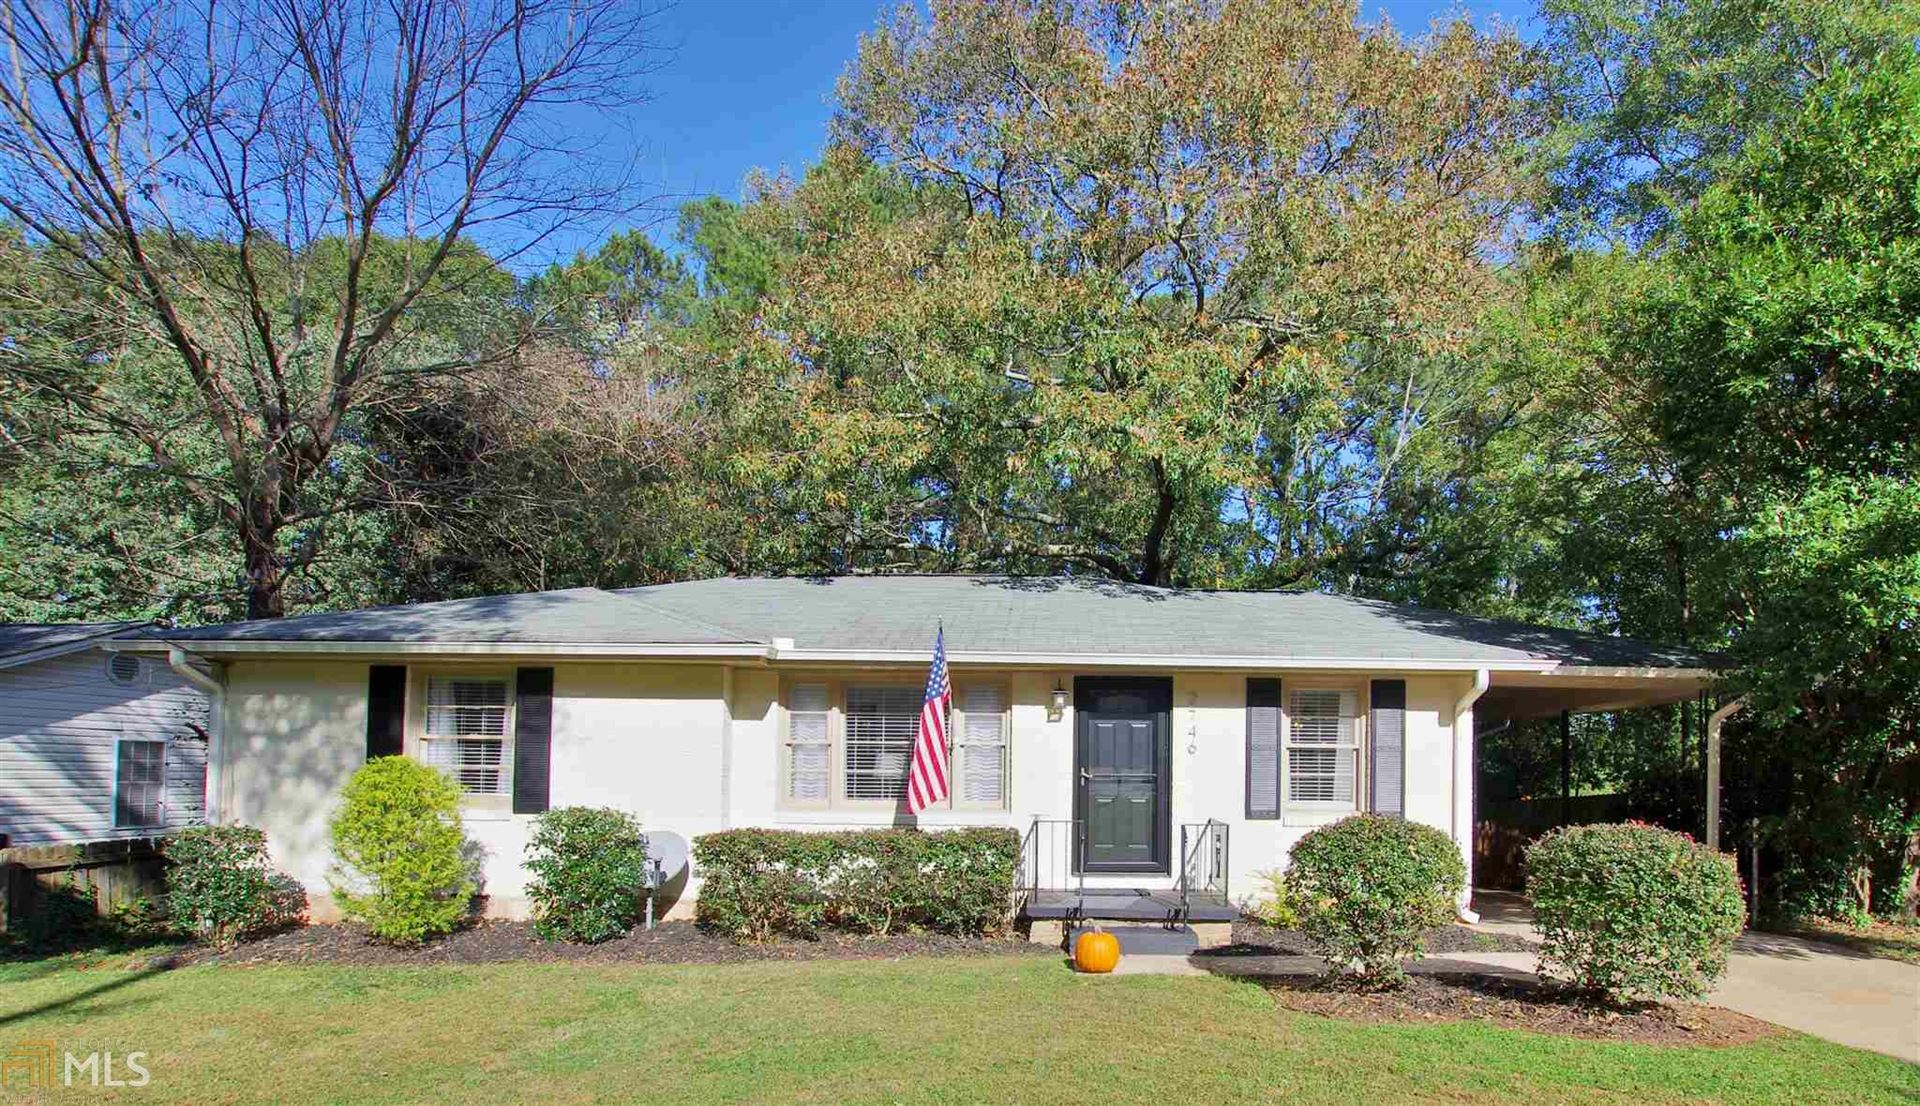 2746 Harrington Dr, Decatur, GA 30033 - MLS#: 8884339